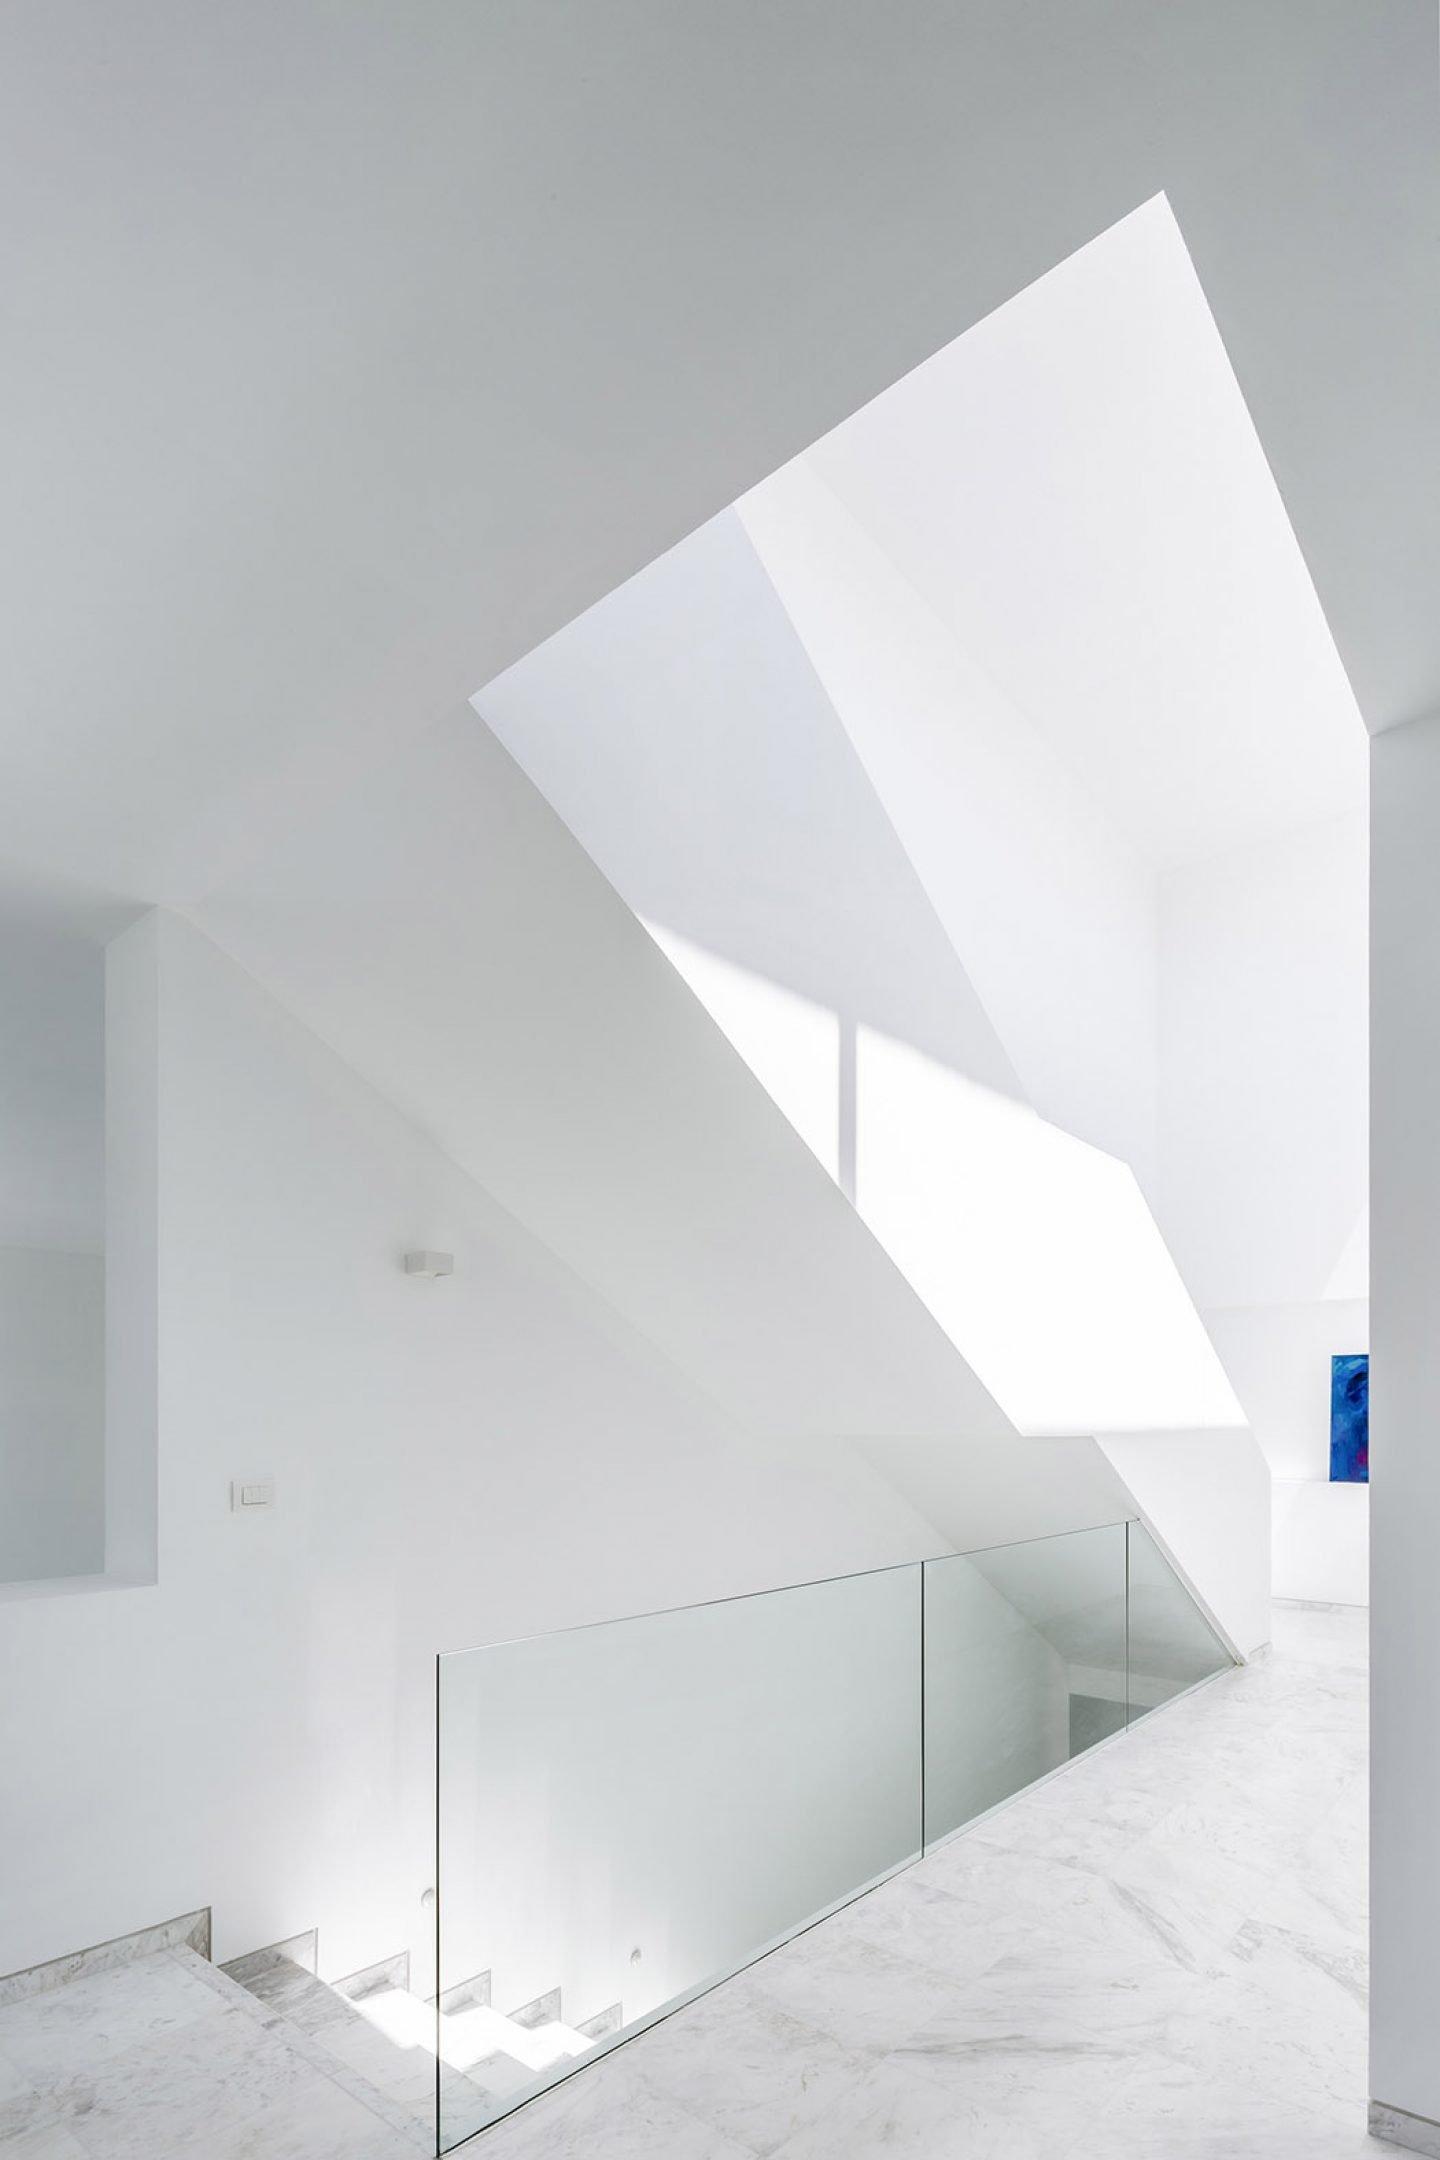 iGNANT_Architecture_Cave_House_Abraham_Cota_Paredes19